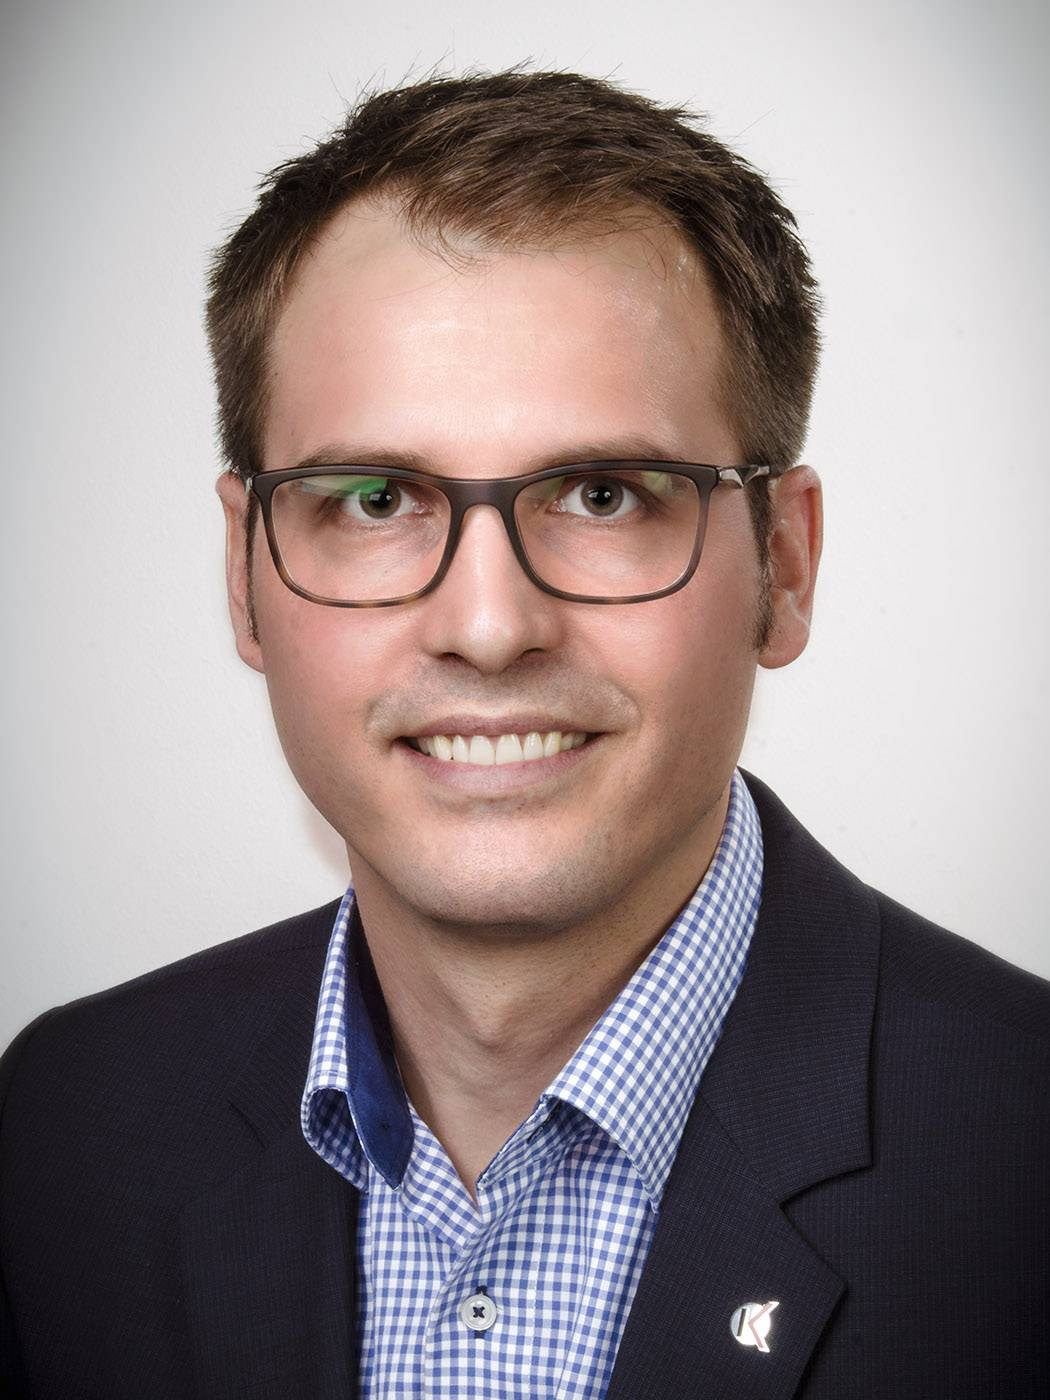 Sebastian Walther